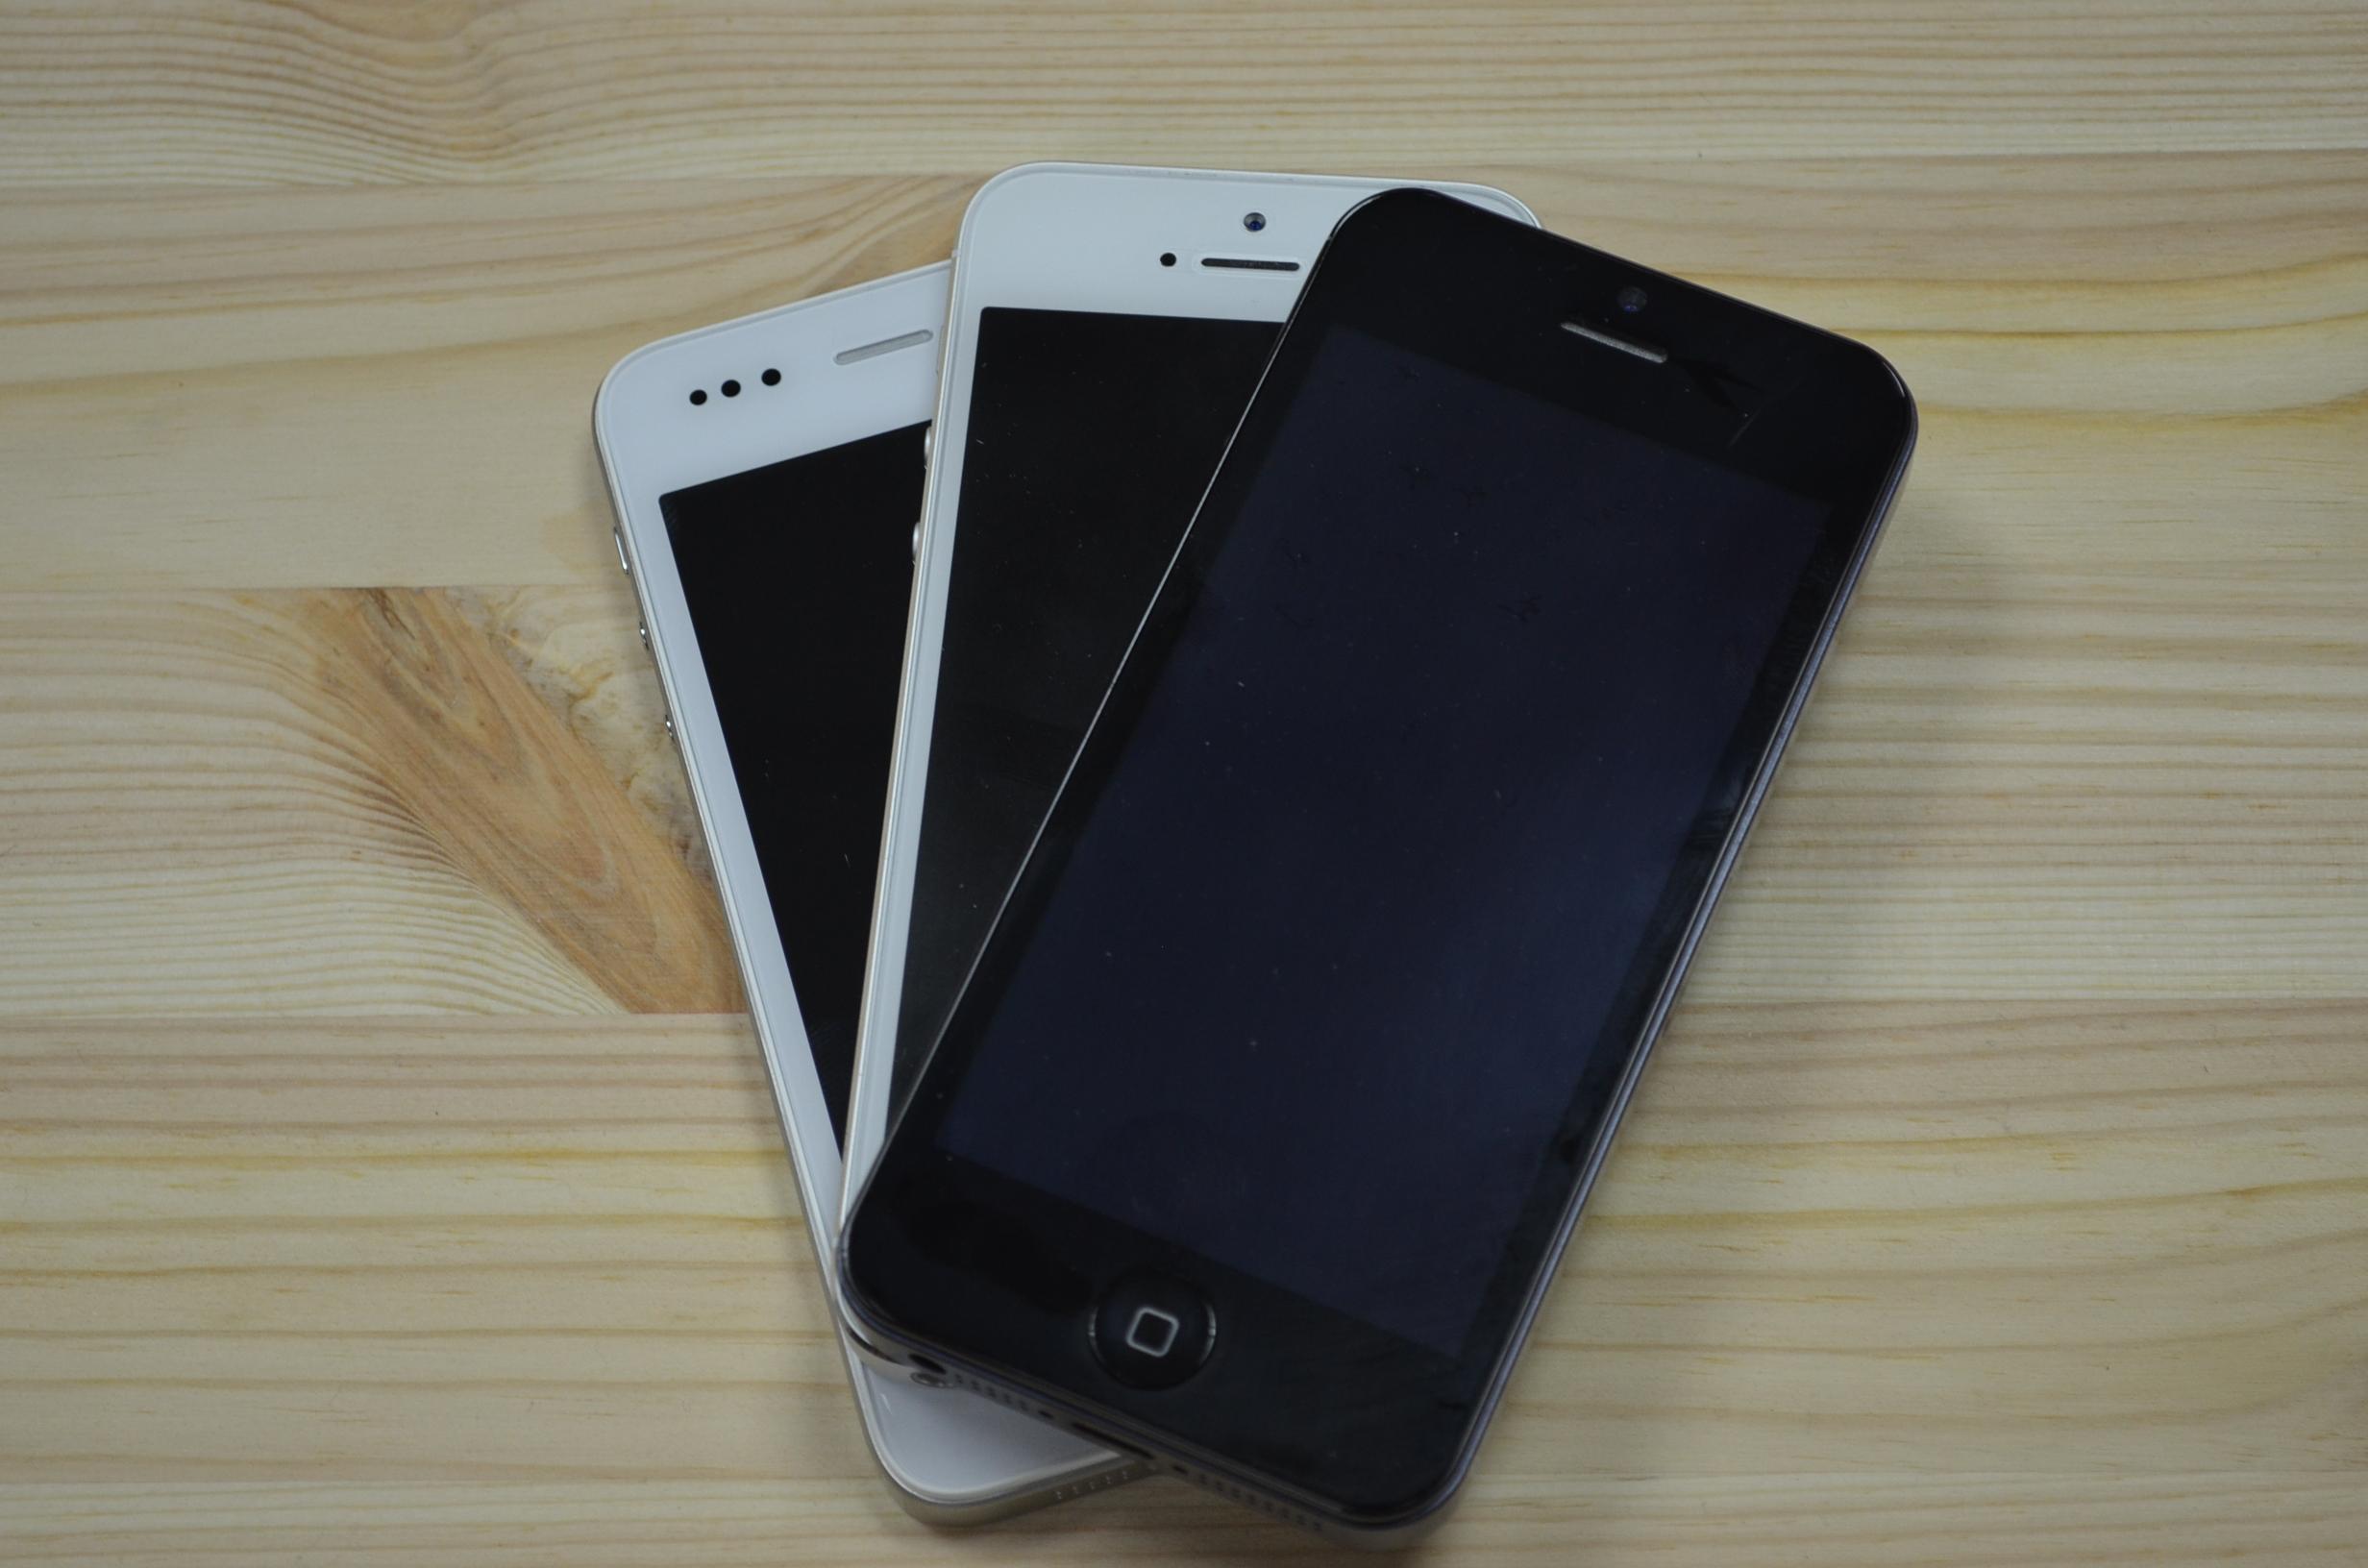 iPhone 5 Klone – Finde das Original